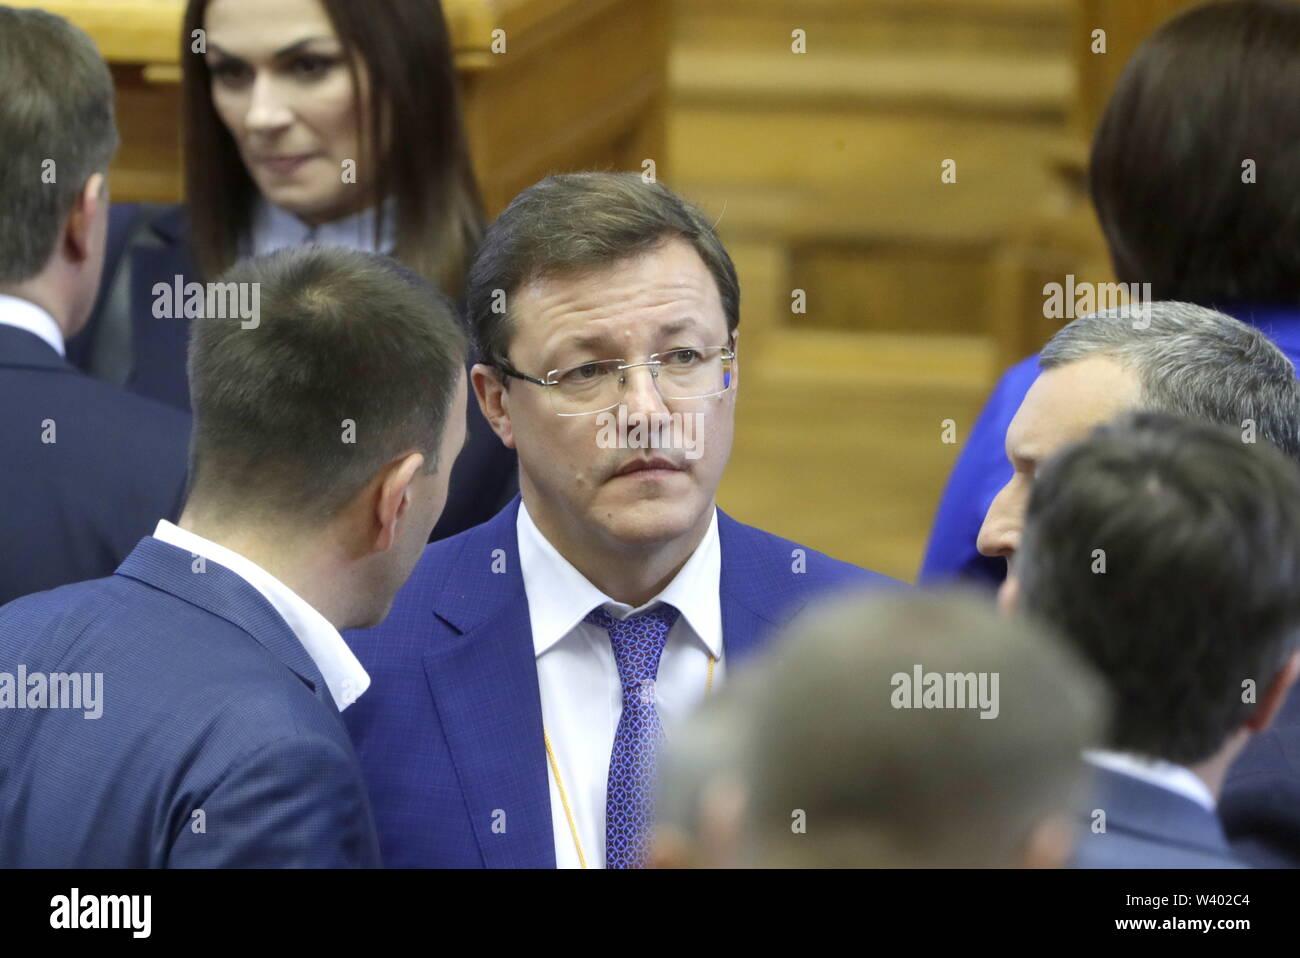 ST PETERSBURG, RUSSIA - JULY 18, 2019: Samara Region Governor Dmitry Azarov (C) attends a plenary meeting at the 6th Belarus-Russia Forum of Regions, Tauride Palace. Mikhail Metzel/TASS - Stock Image